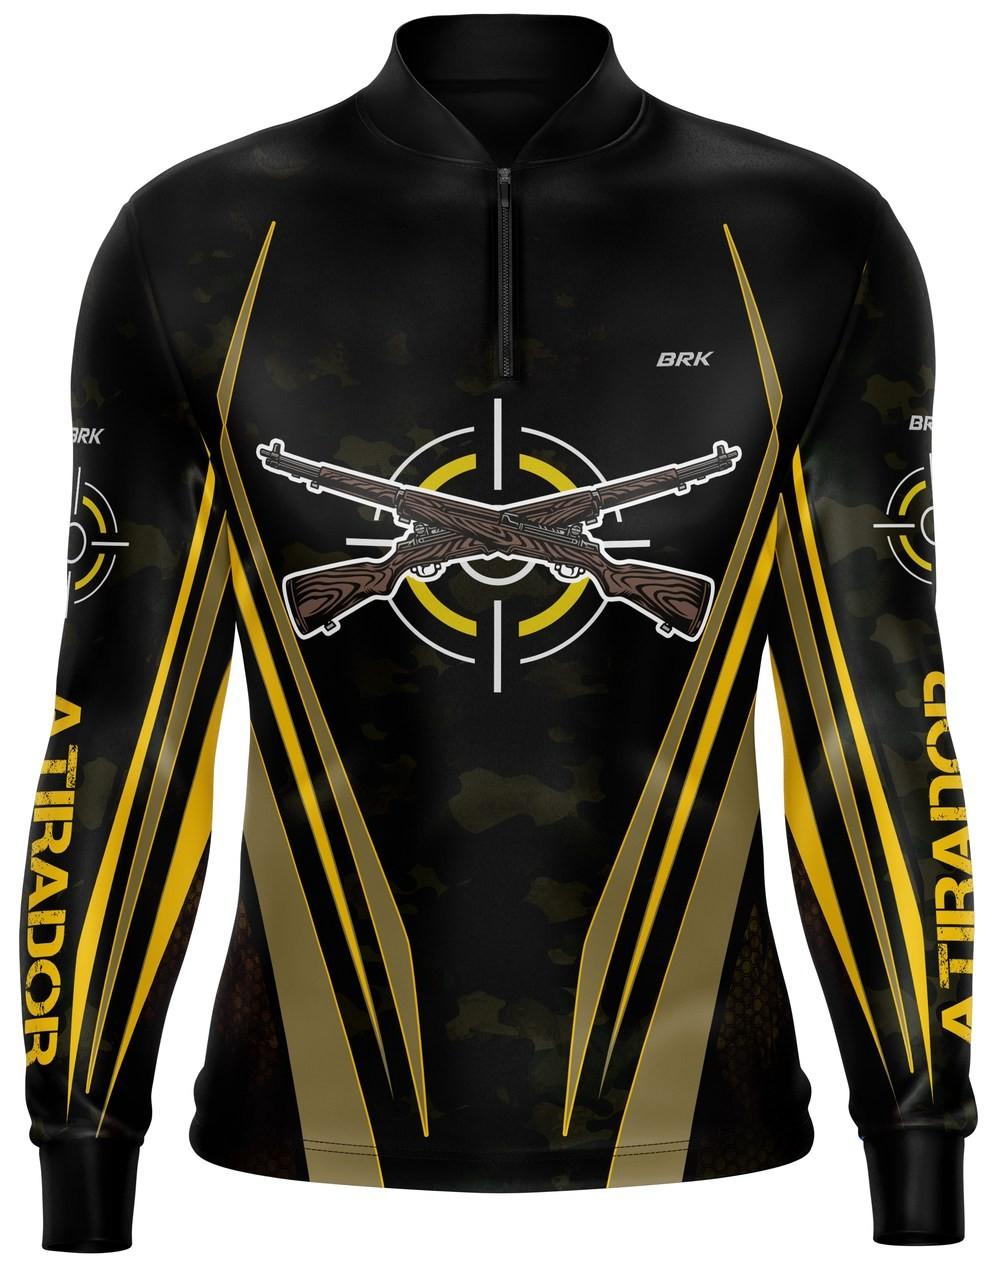 Camiseta Airsoft Brk Atirador Camuflada com FPU 50+